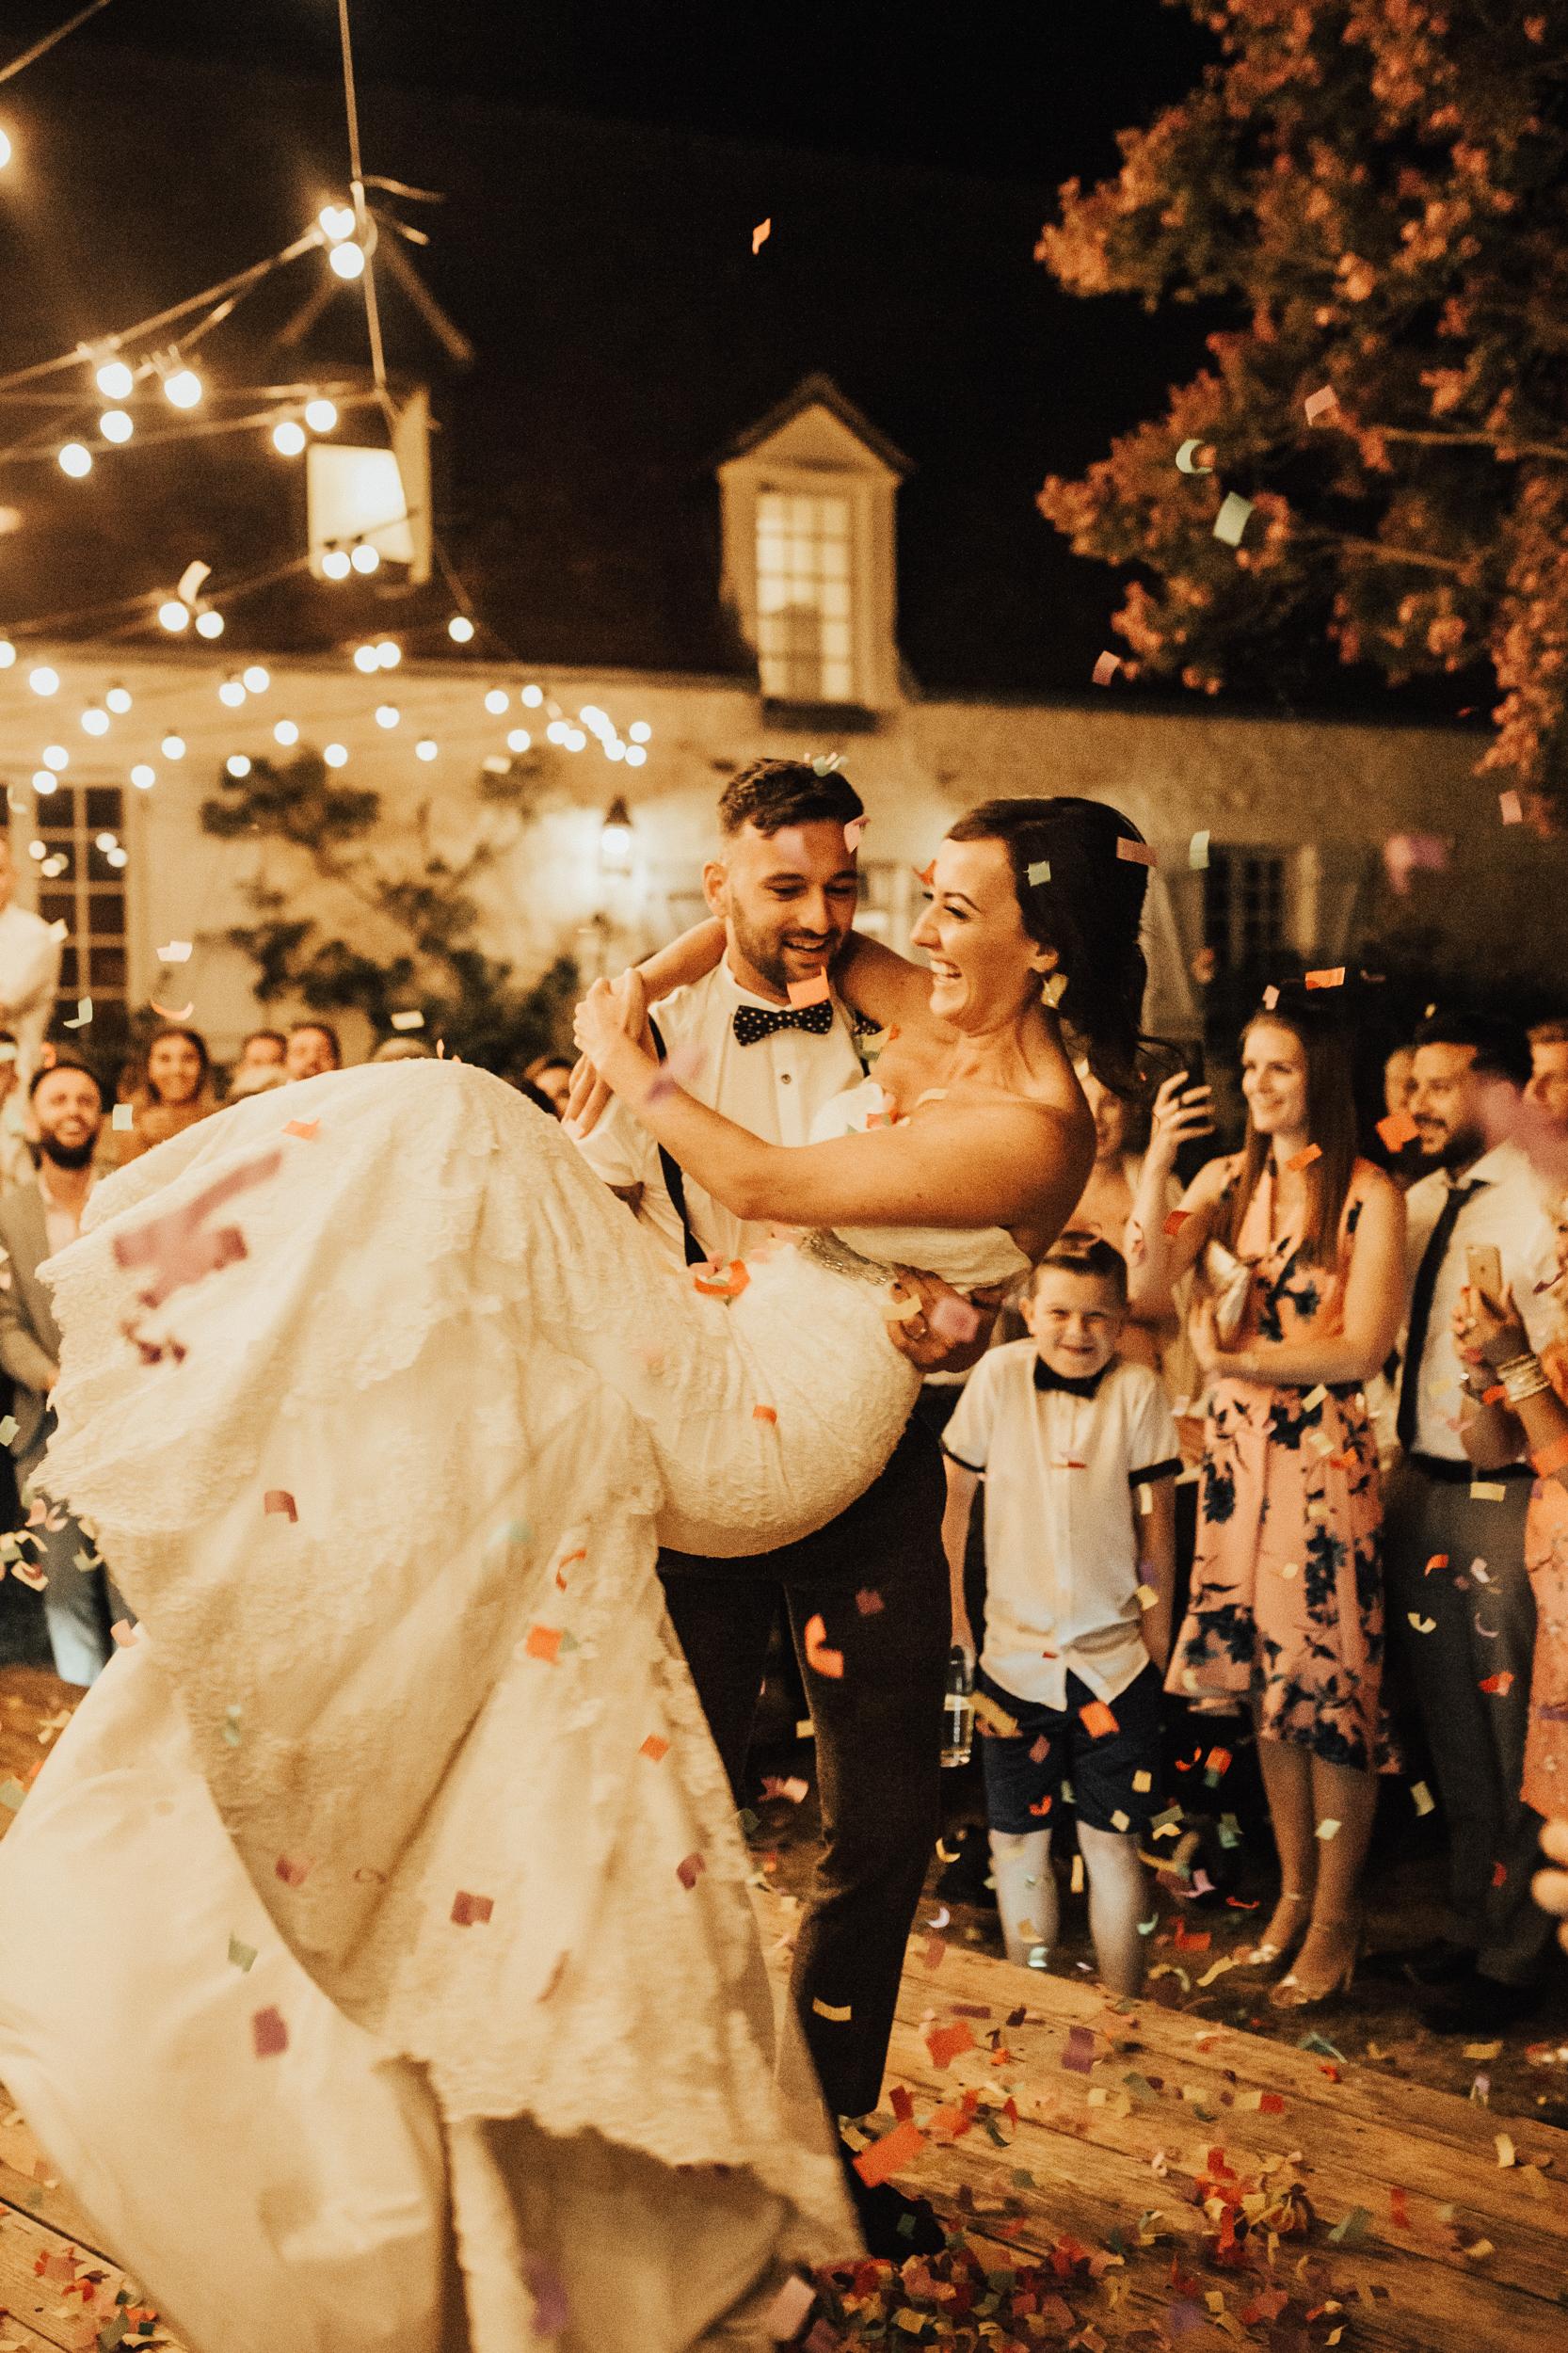 Amy-Zac-Destination-Wedding-France-Manoir-Foulquetiere-Darina-Stoda-Photography-119.jpg